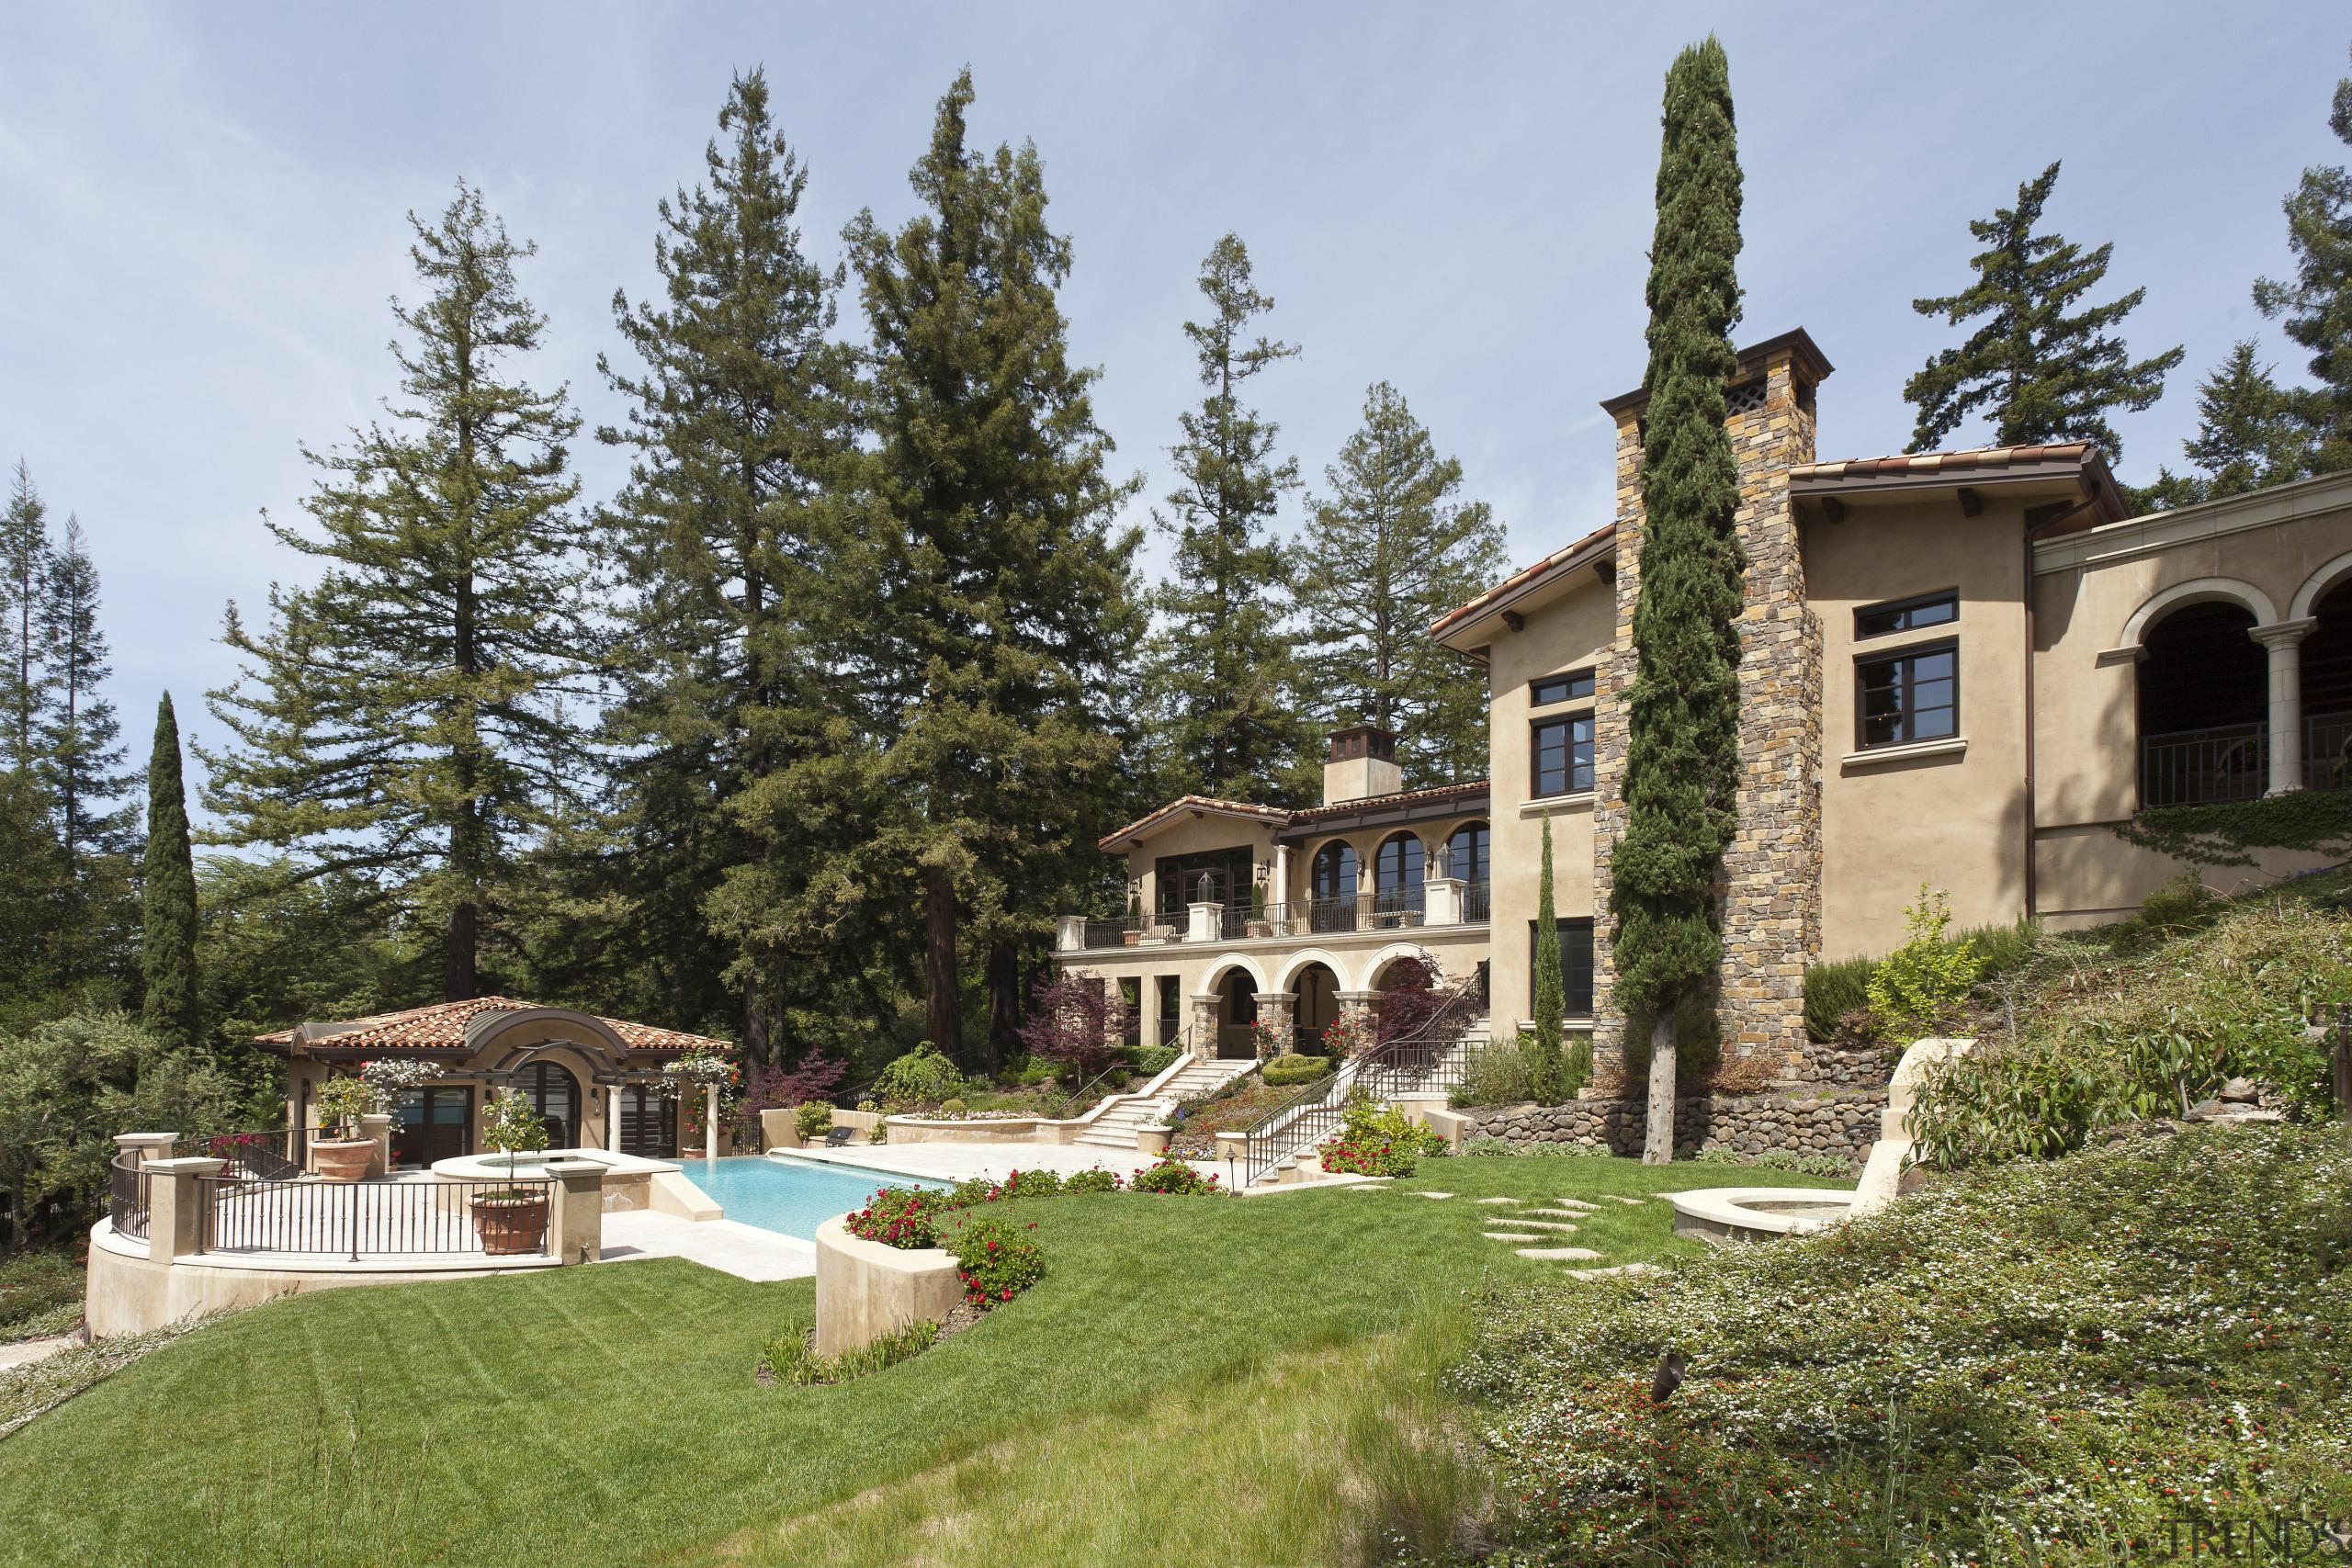 Santa Barbara-Meditteranean-style interior by Alison Whittaker cottage, estate, hacienda, home, house, mansion, property, real estate, tree, villa, brown